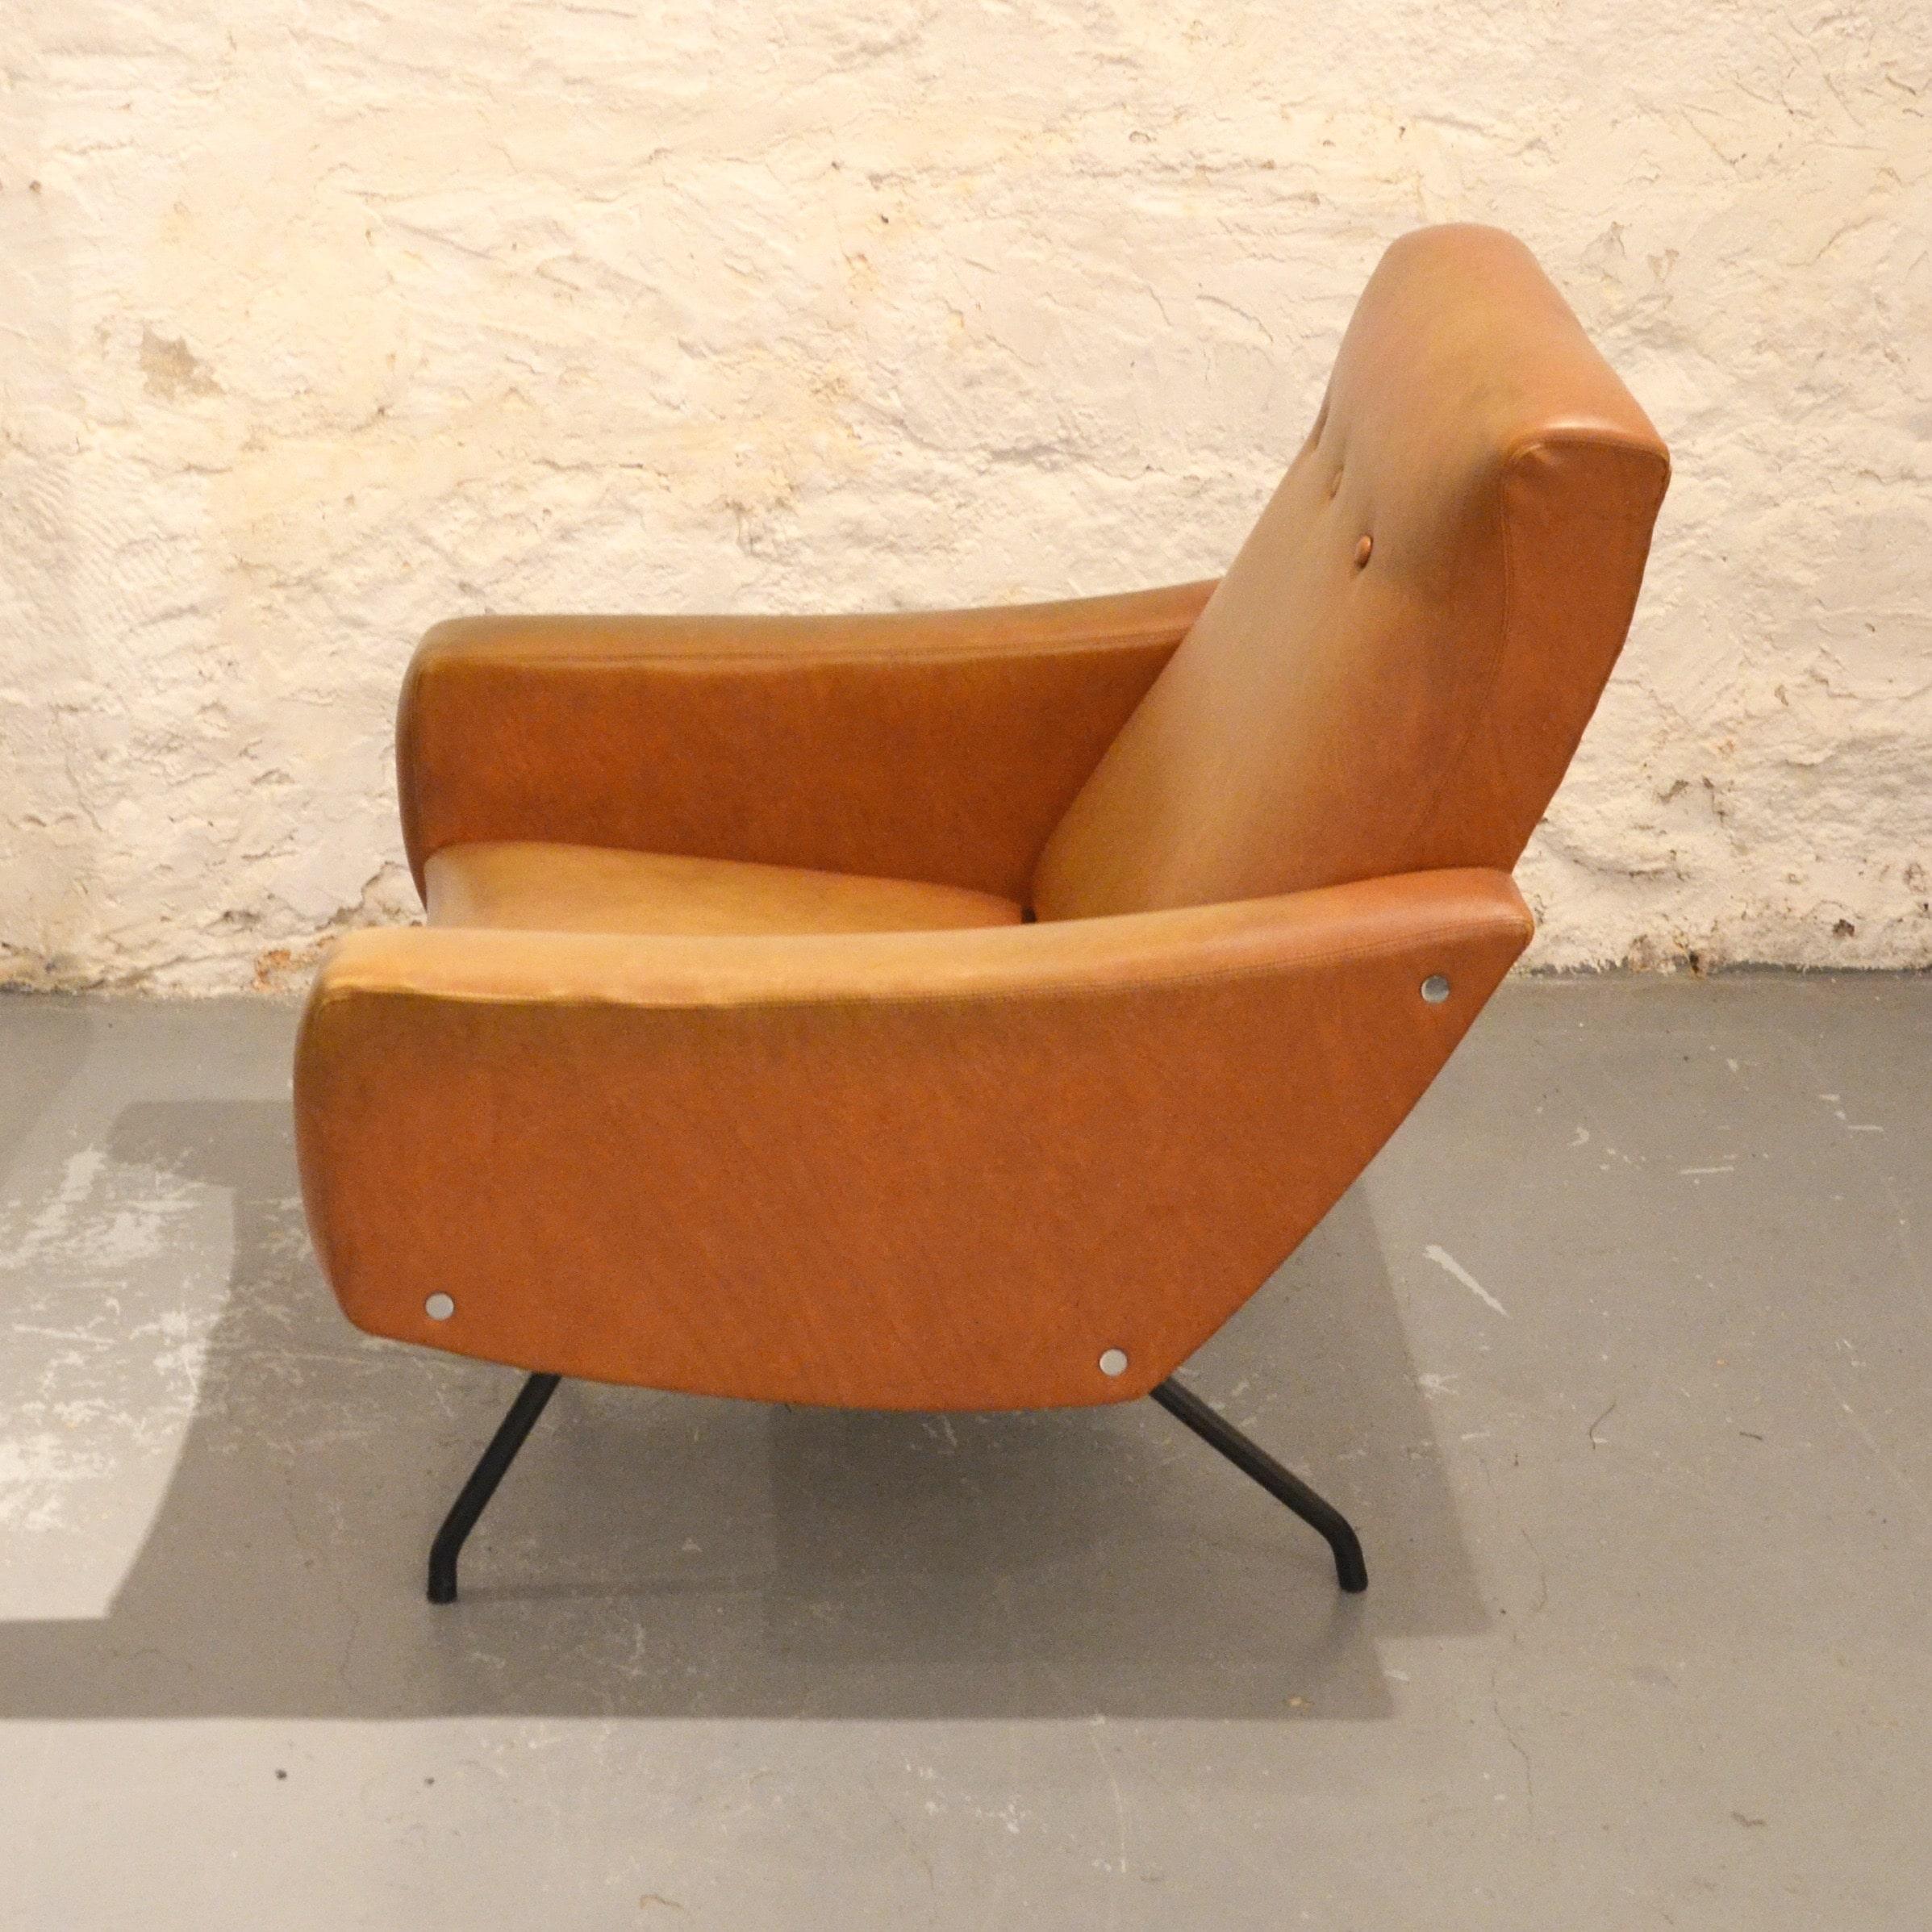 fauteuil steiner ann es 60 bindiesbindies. Black Bedroom Furniture Sets. Home Design Ideas